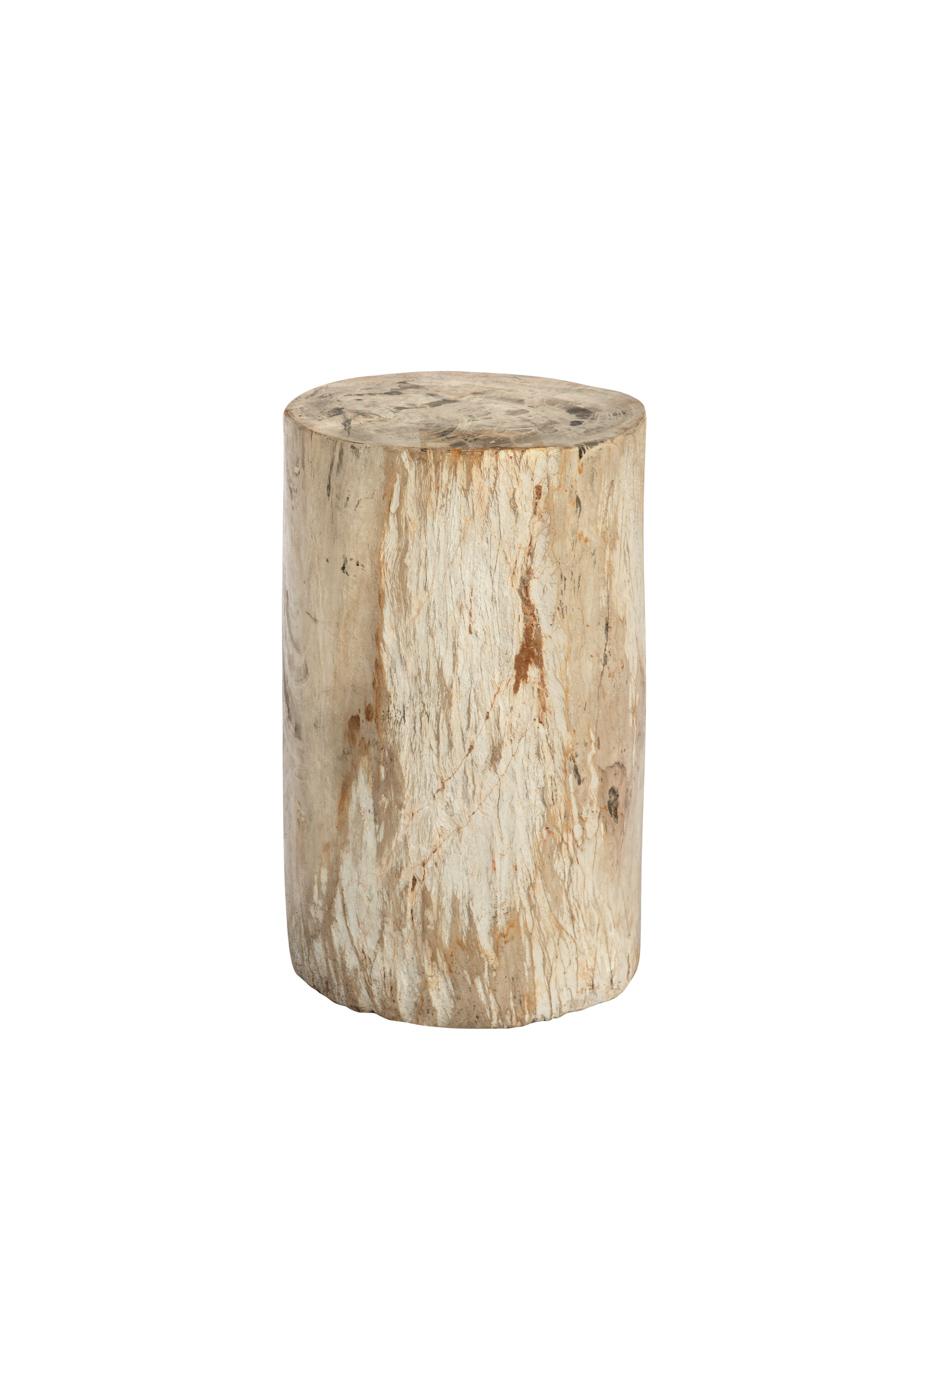 Tronco de madera fosilizada natural